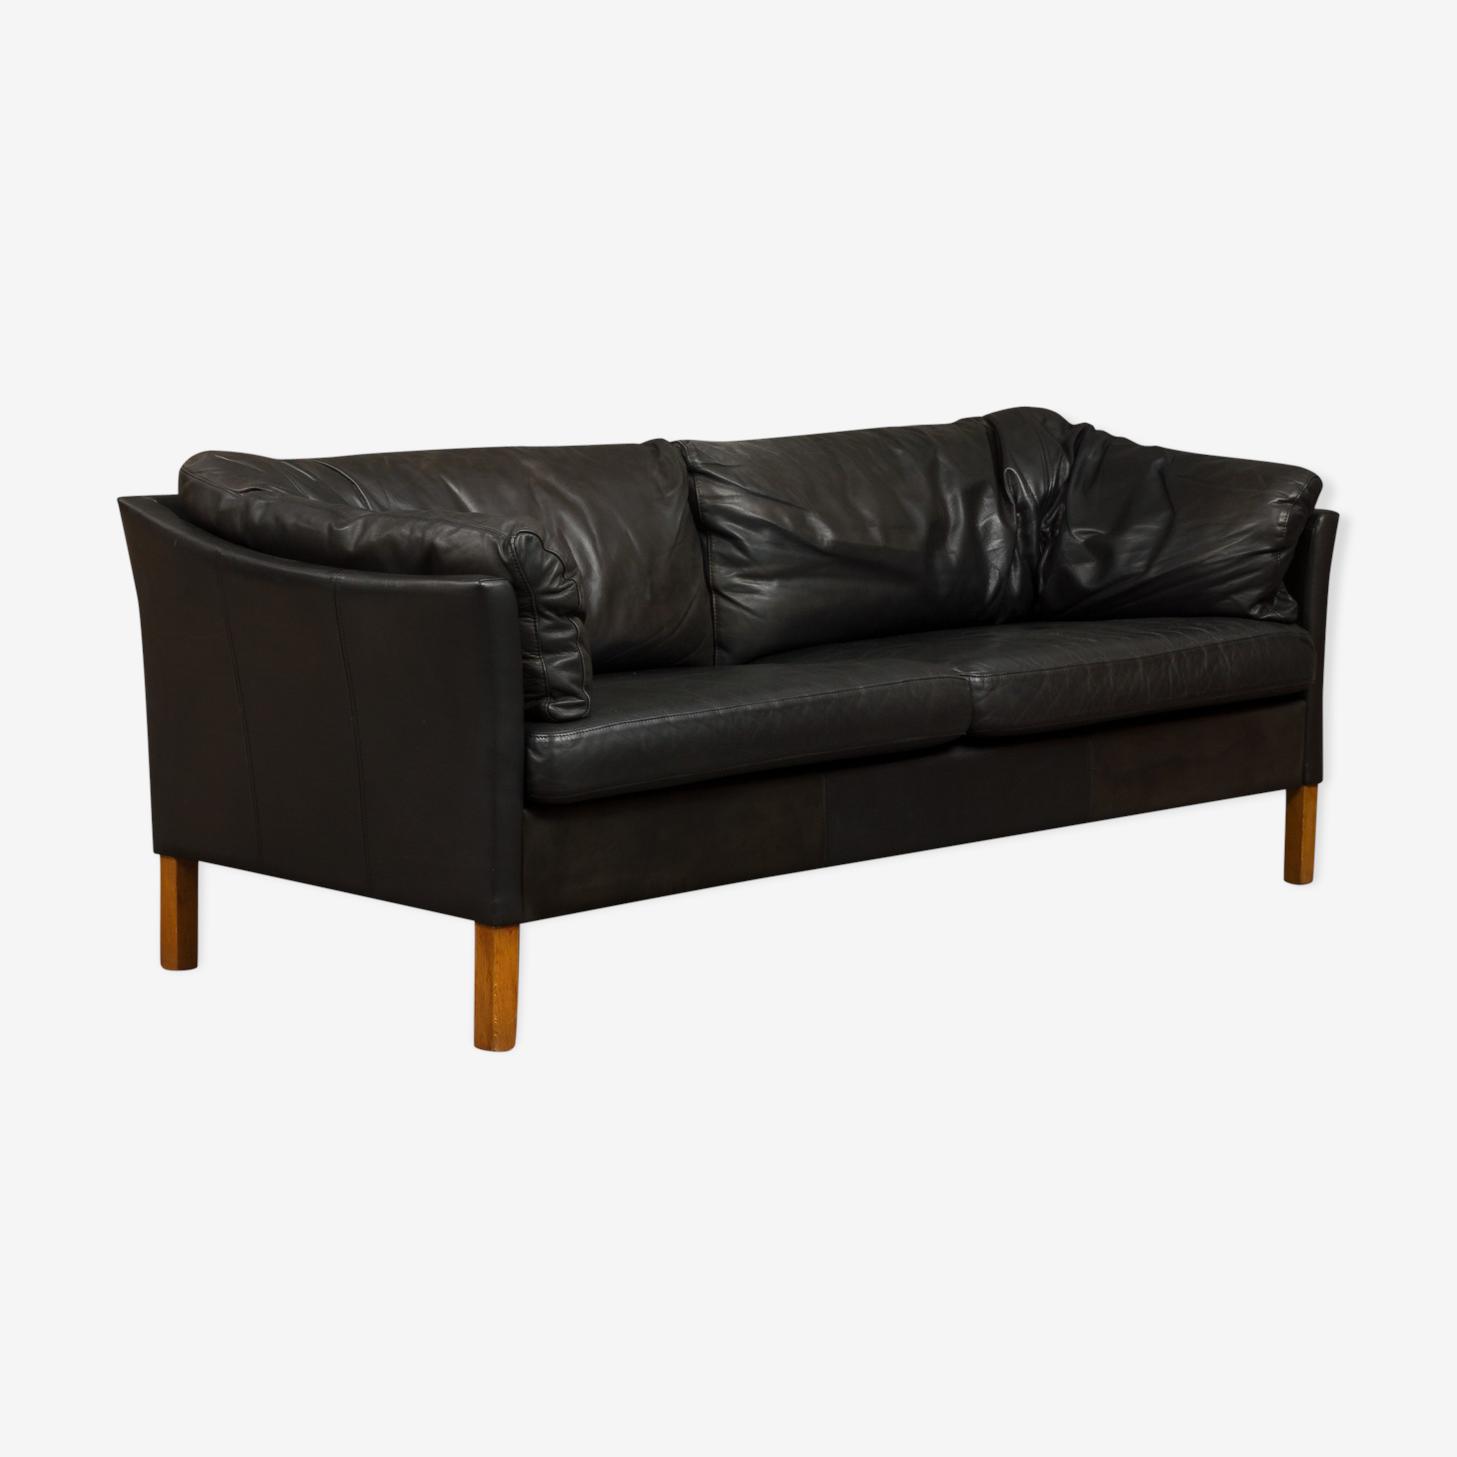 Sofa en cuir noir Mogens Hansen 2,5